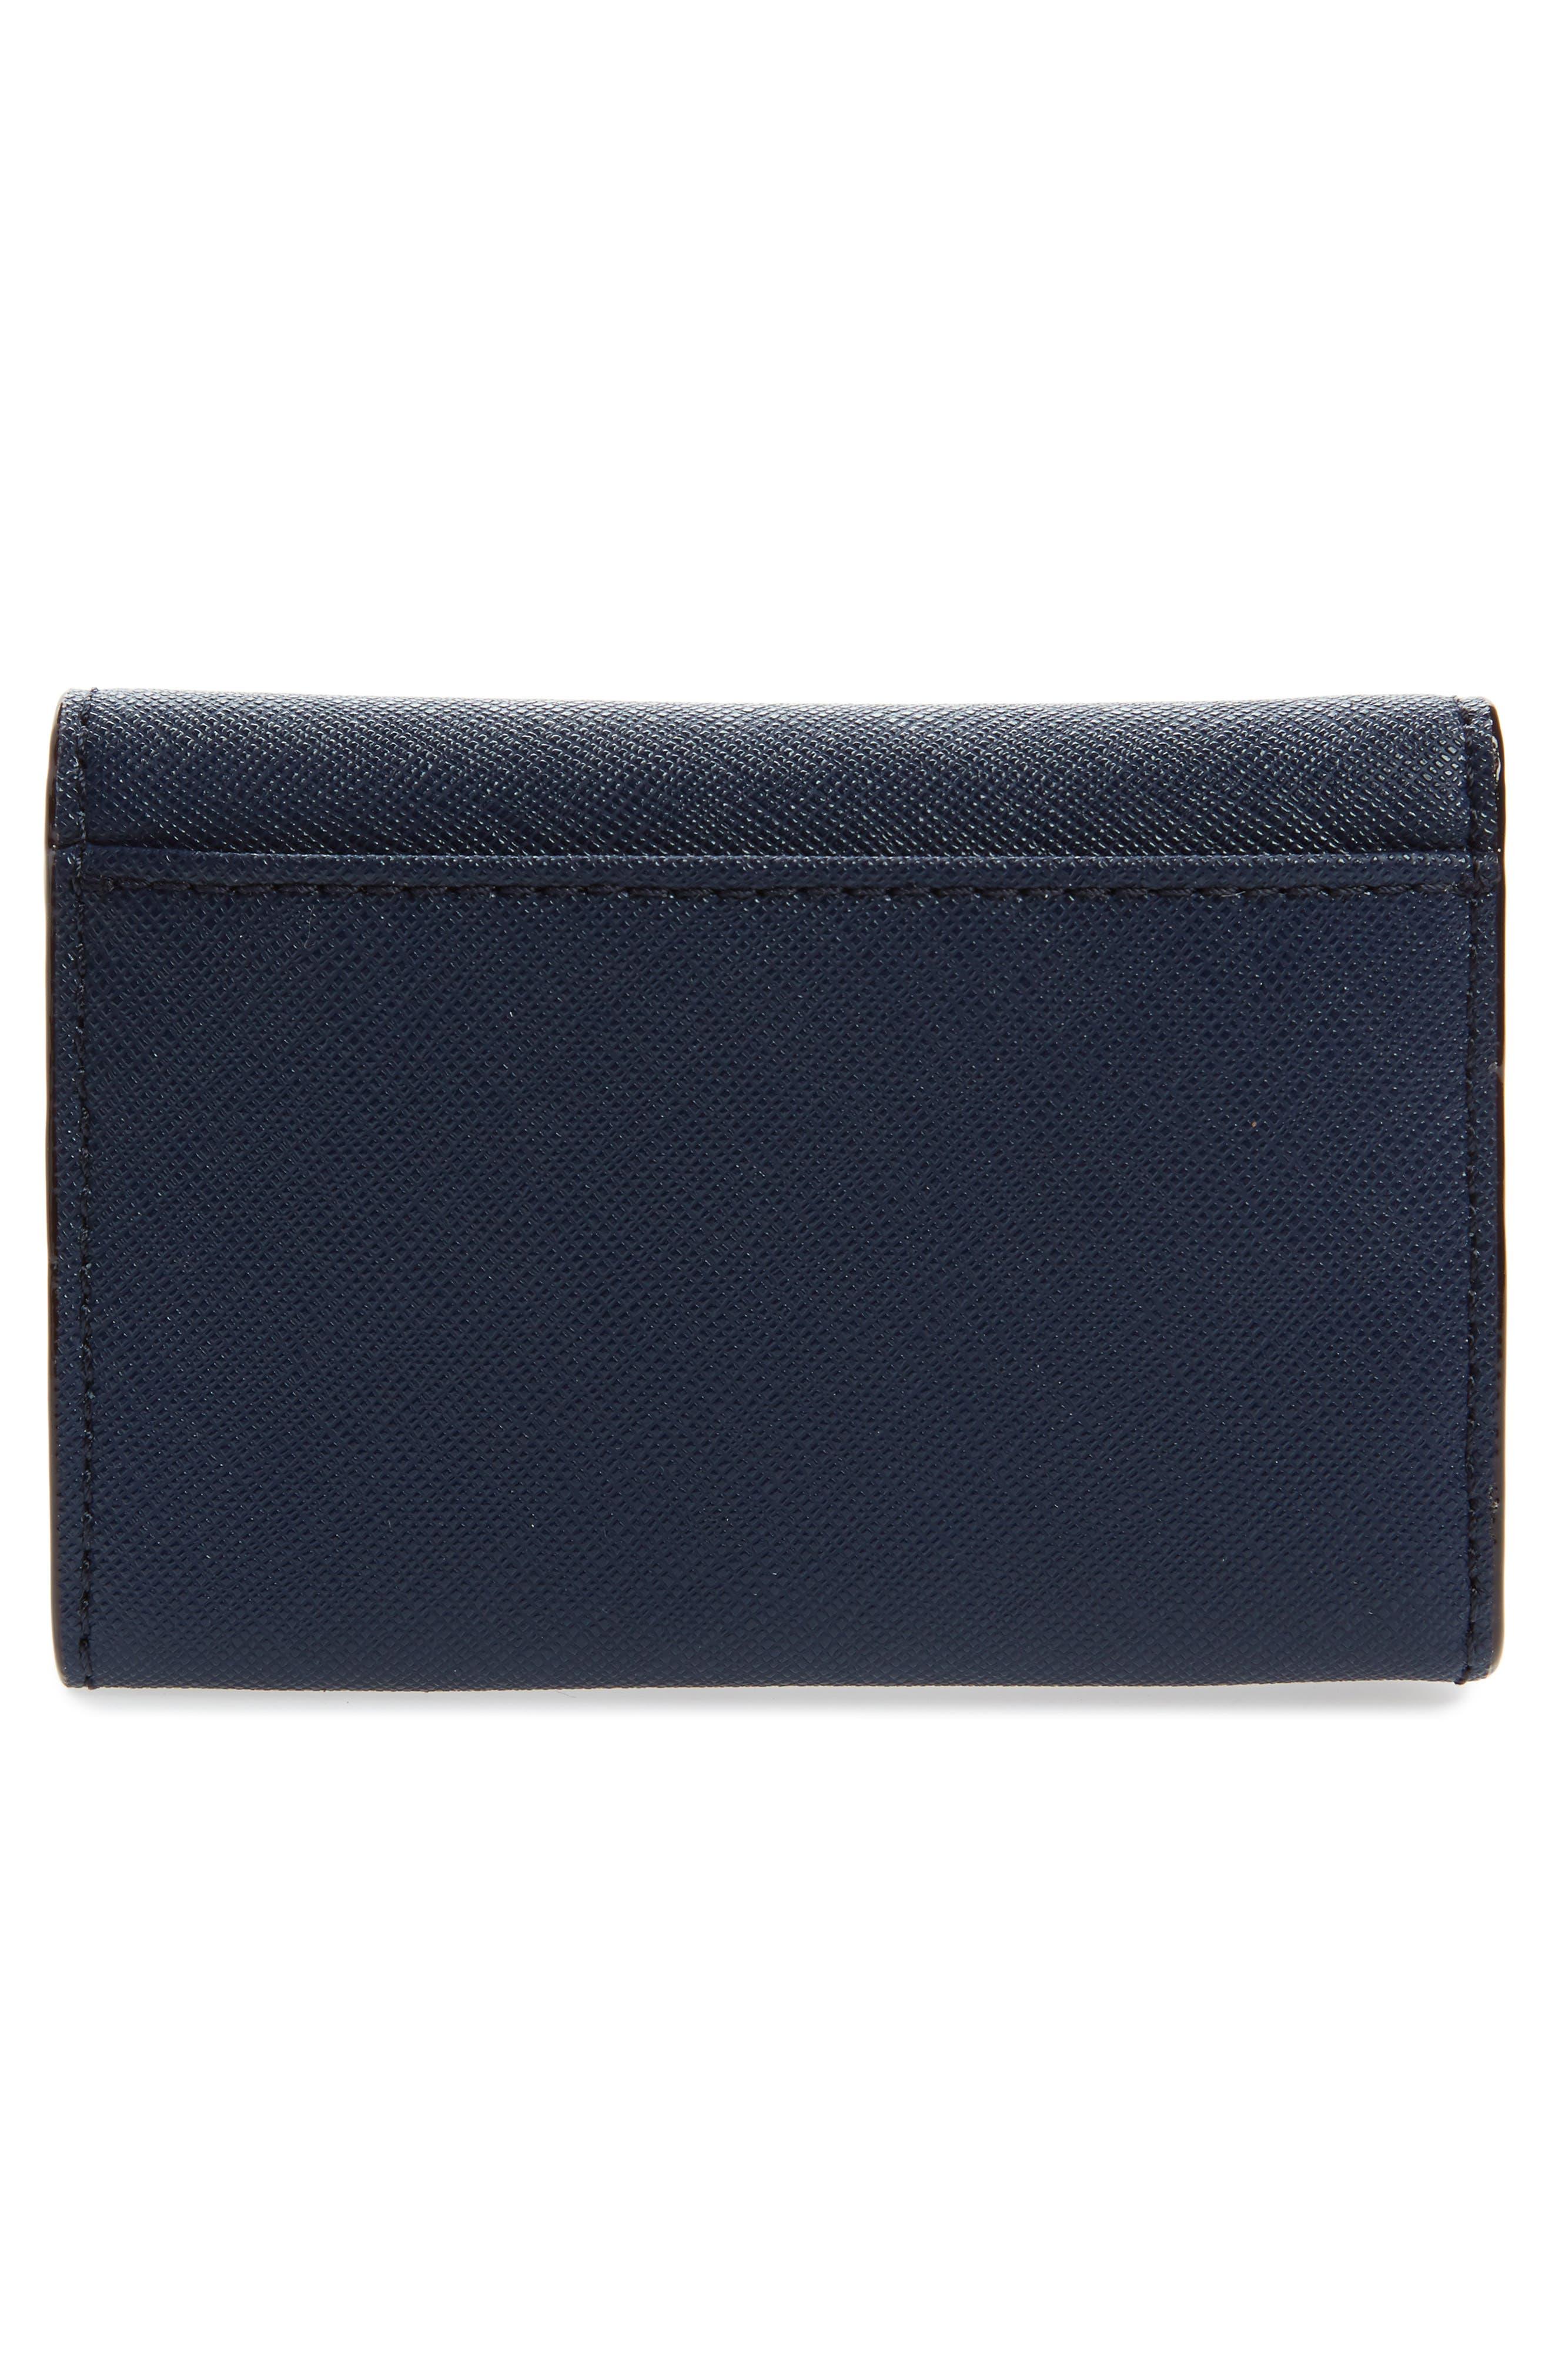 cameron street - farren leather card case,                             Alternate thumbnail 11, color,